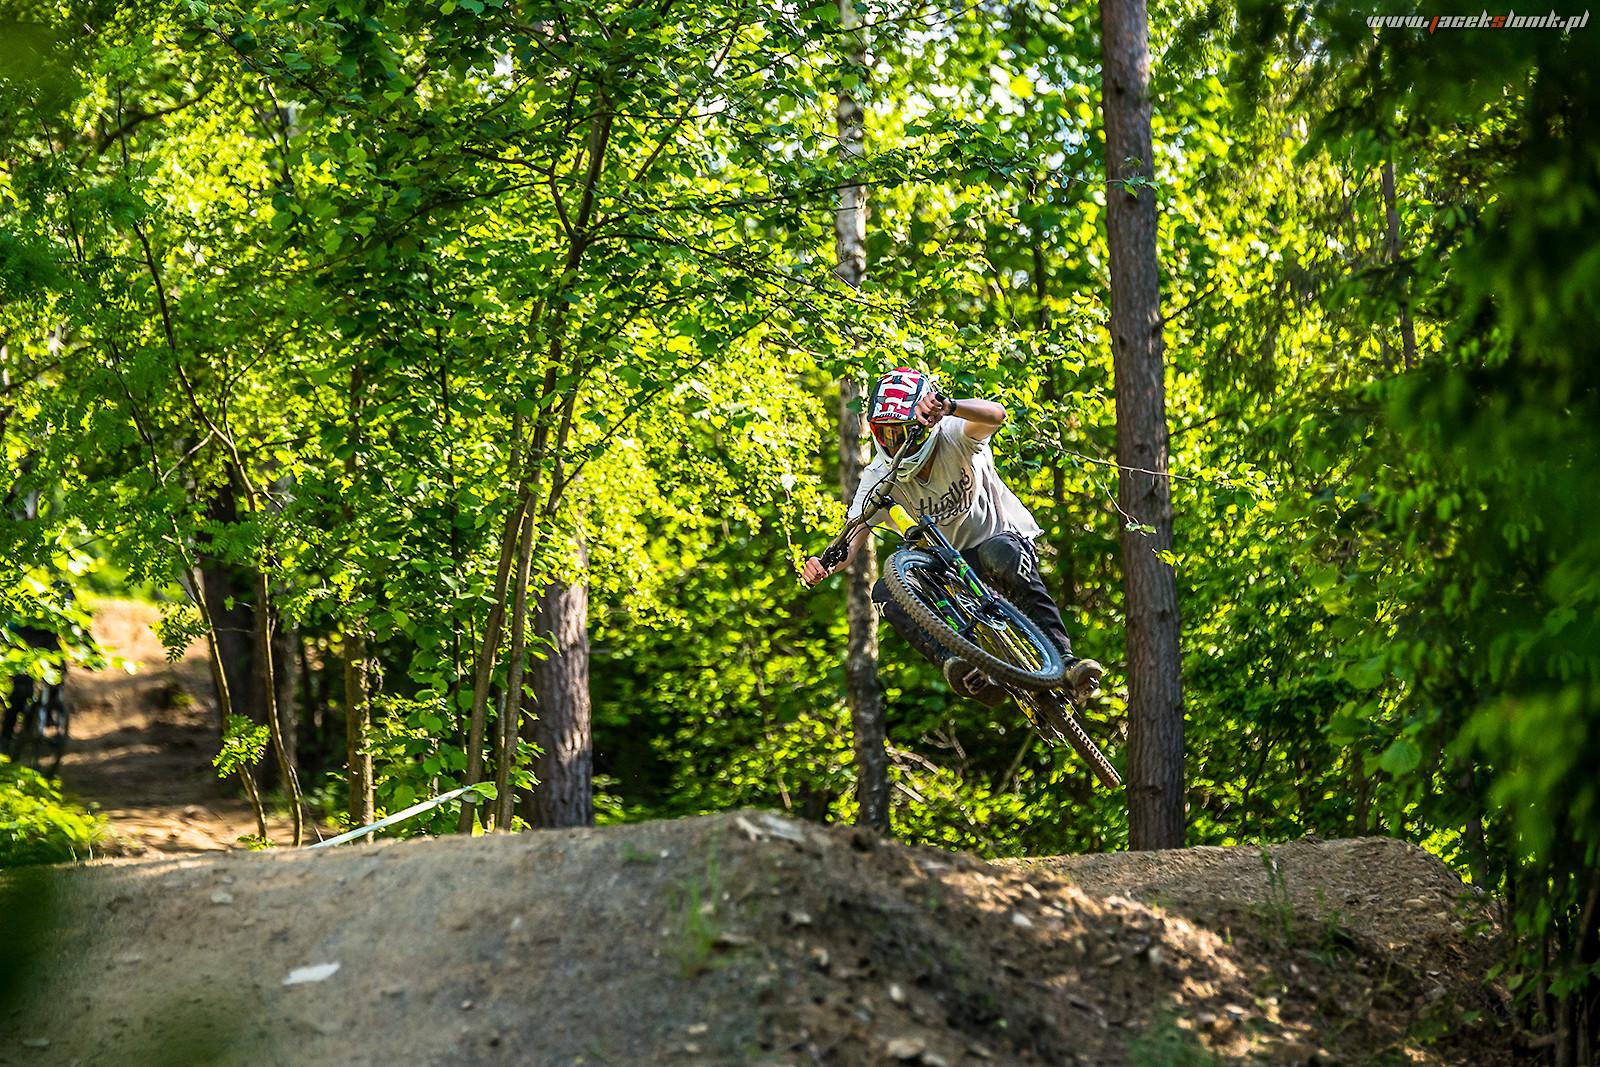 Scrub it! - JacekSlonik - Mountain Biking Pictures - Vital MTB